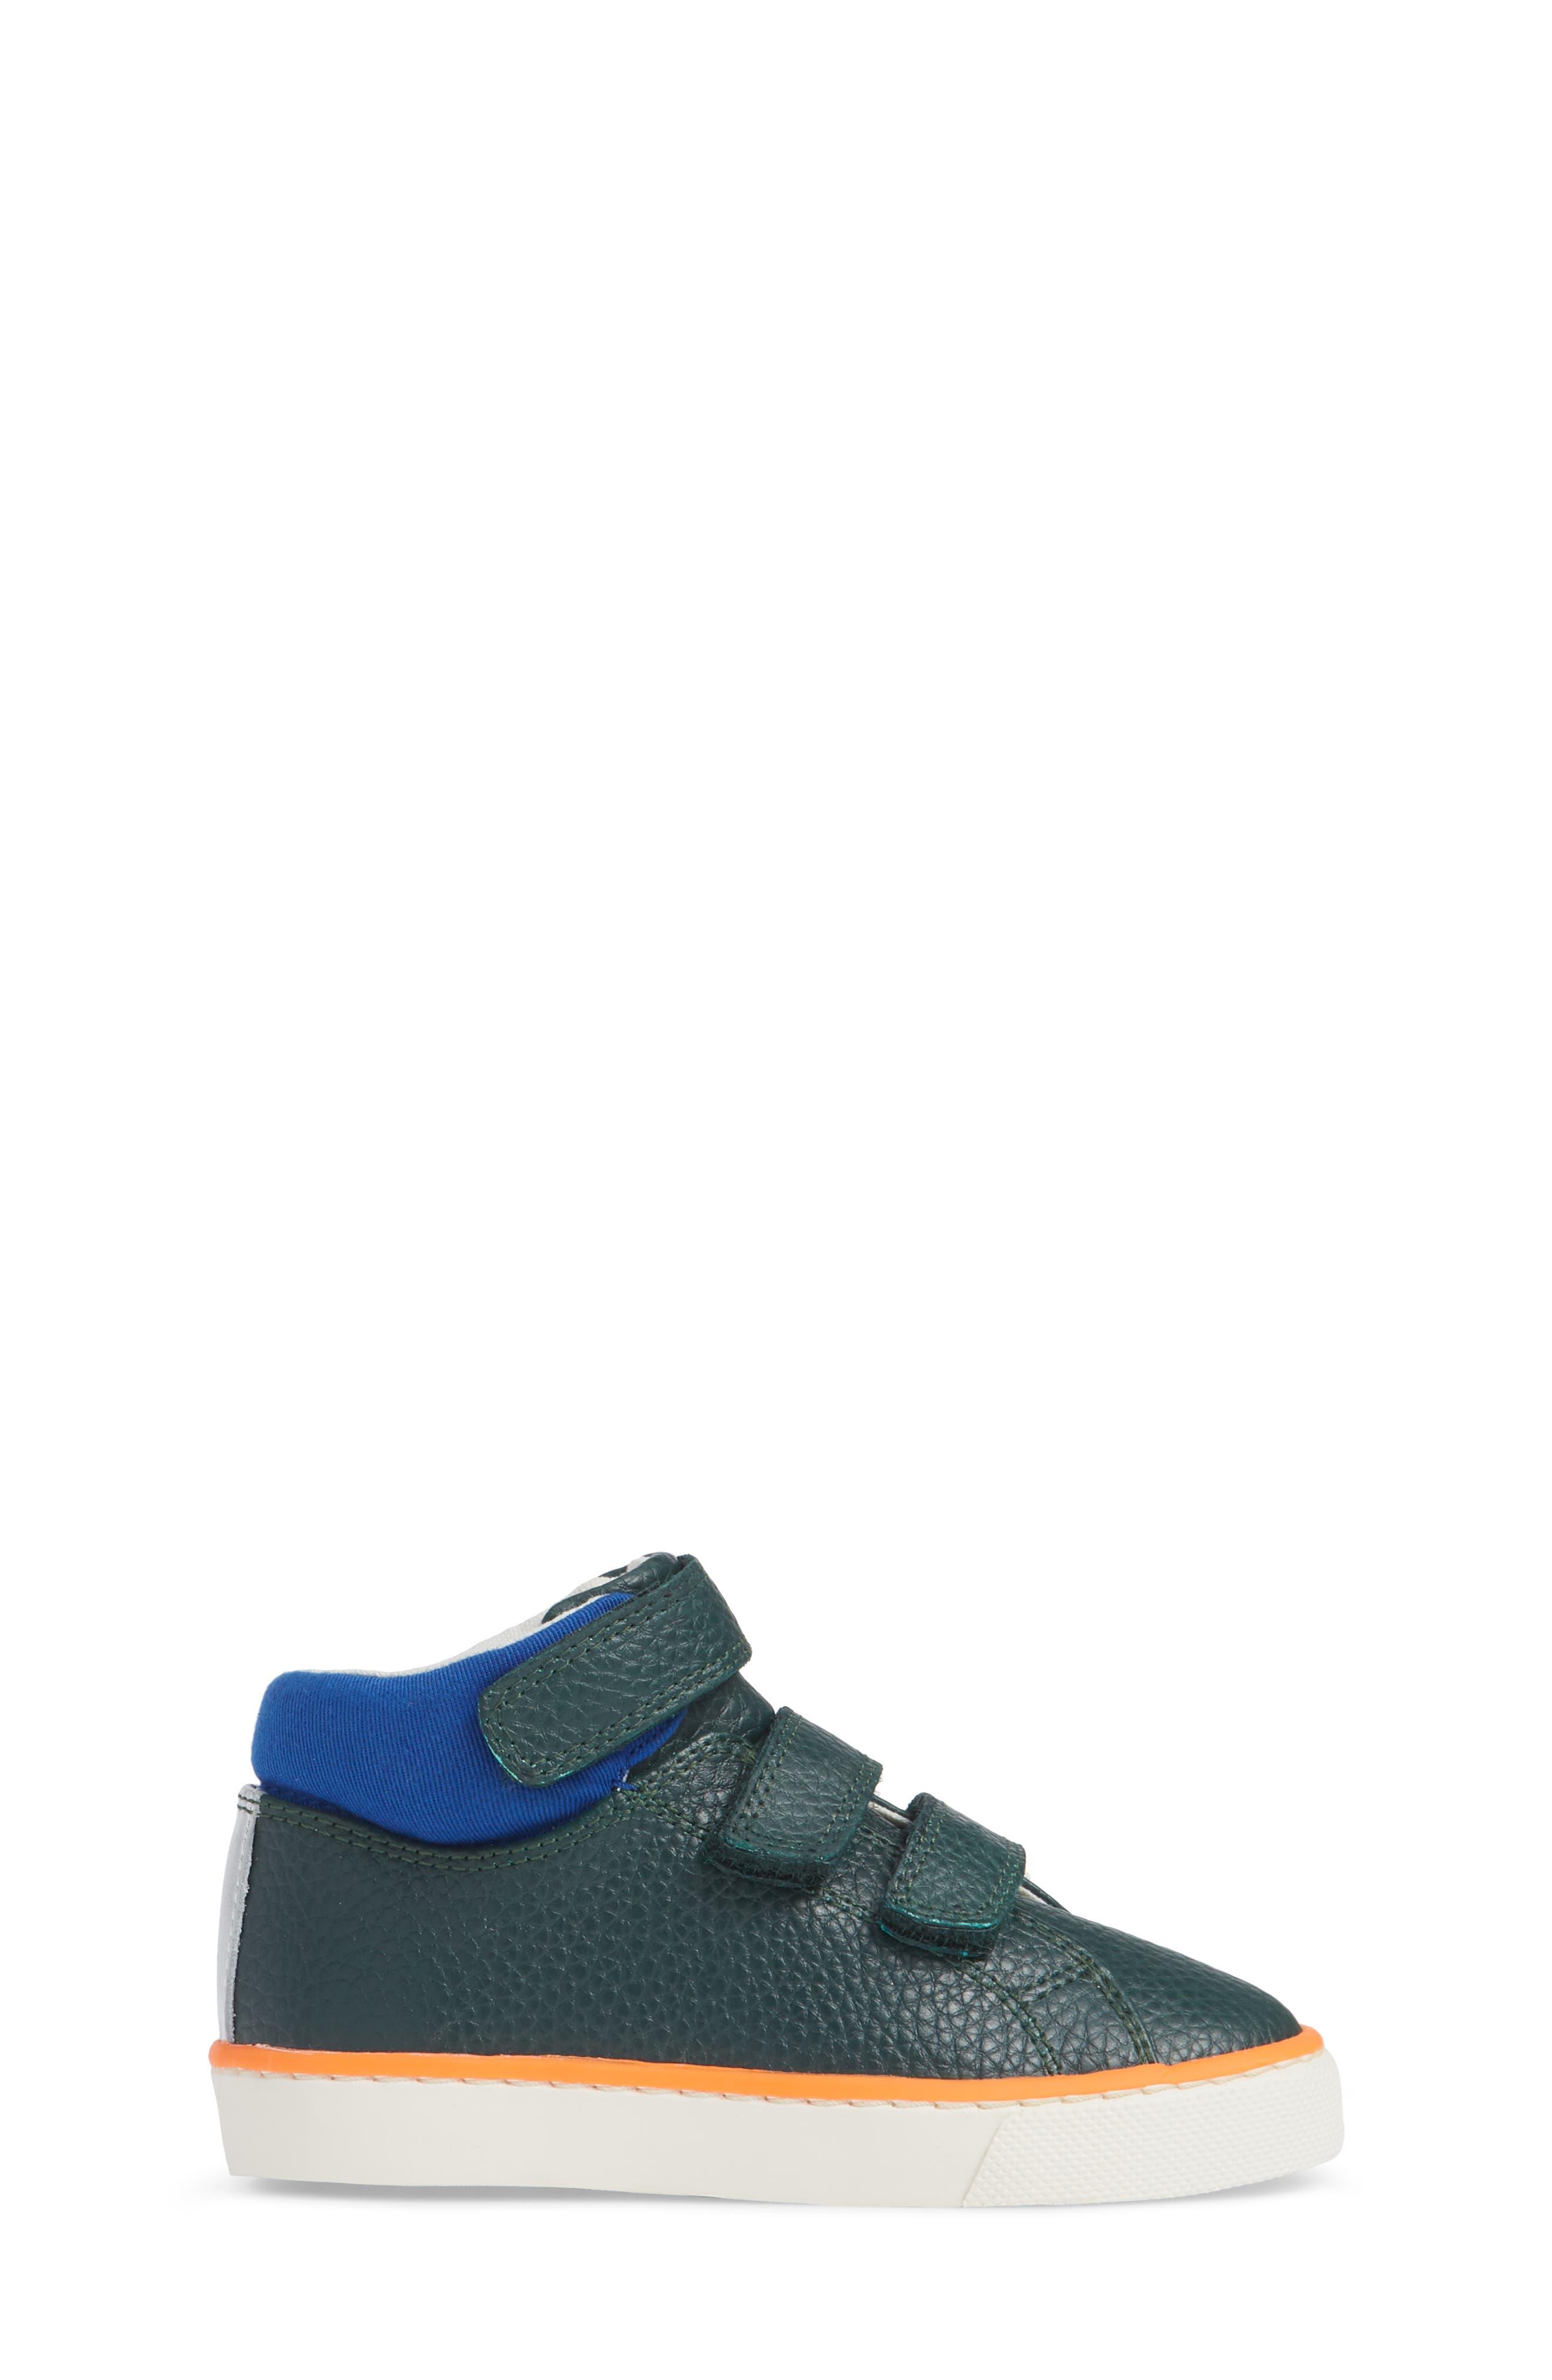 High Top Sneaker,                             Alternate thumbnail 3, color,                             SCOTTS PINE GREEN